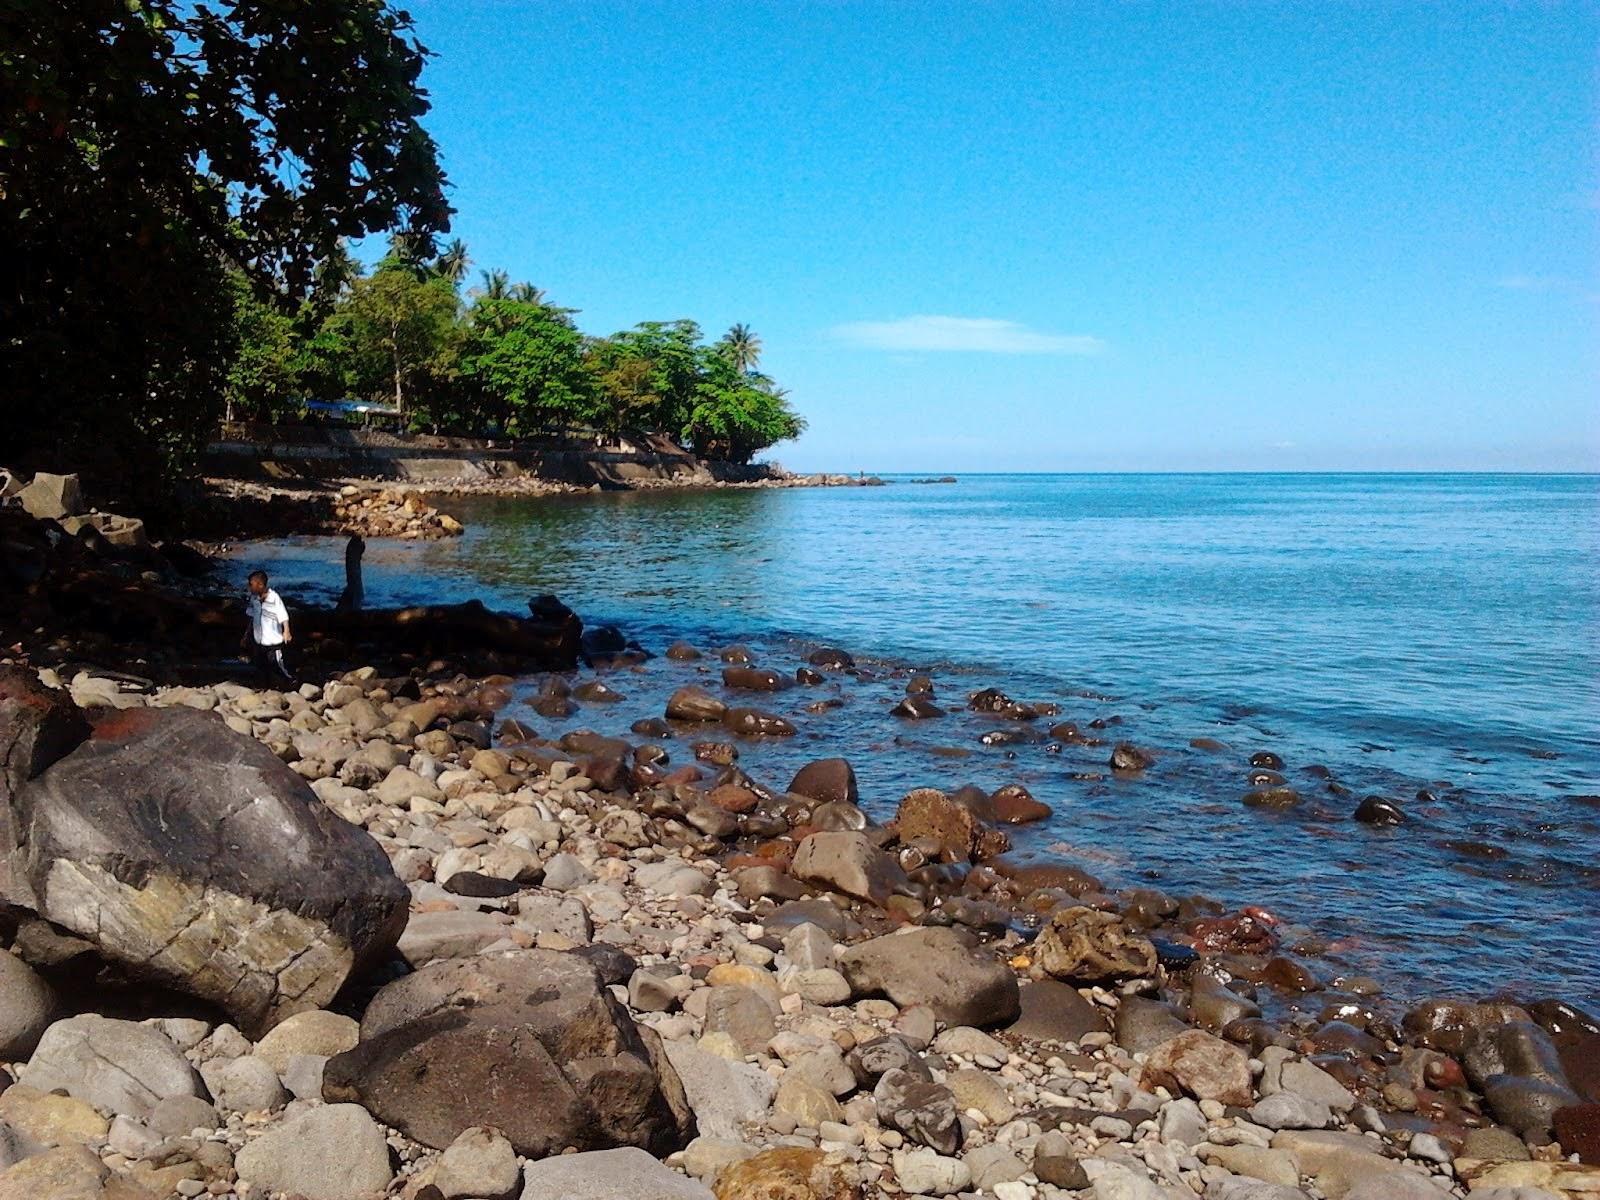 Inilah Rincian Kecamatan Malalayang Kota Manado News Pantai